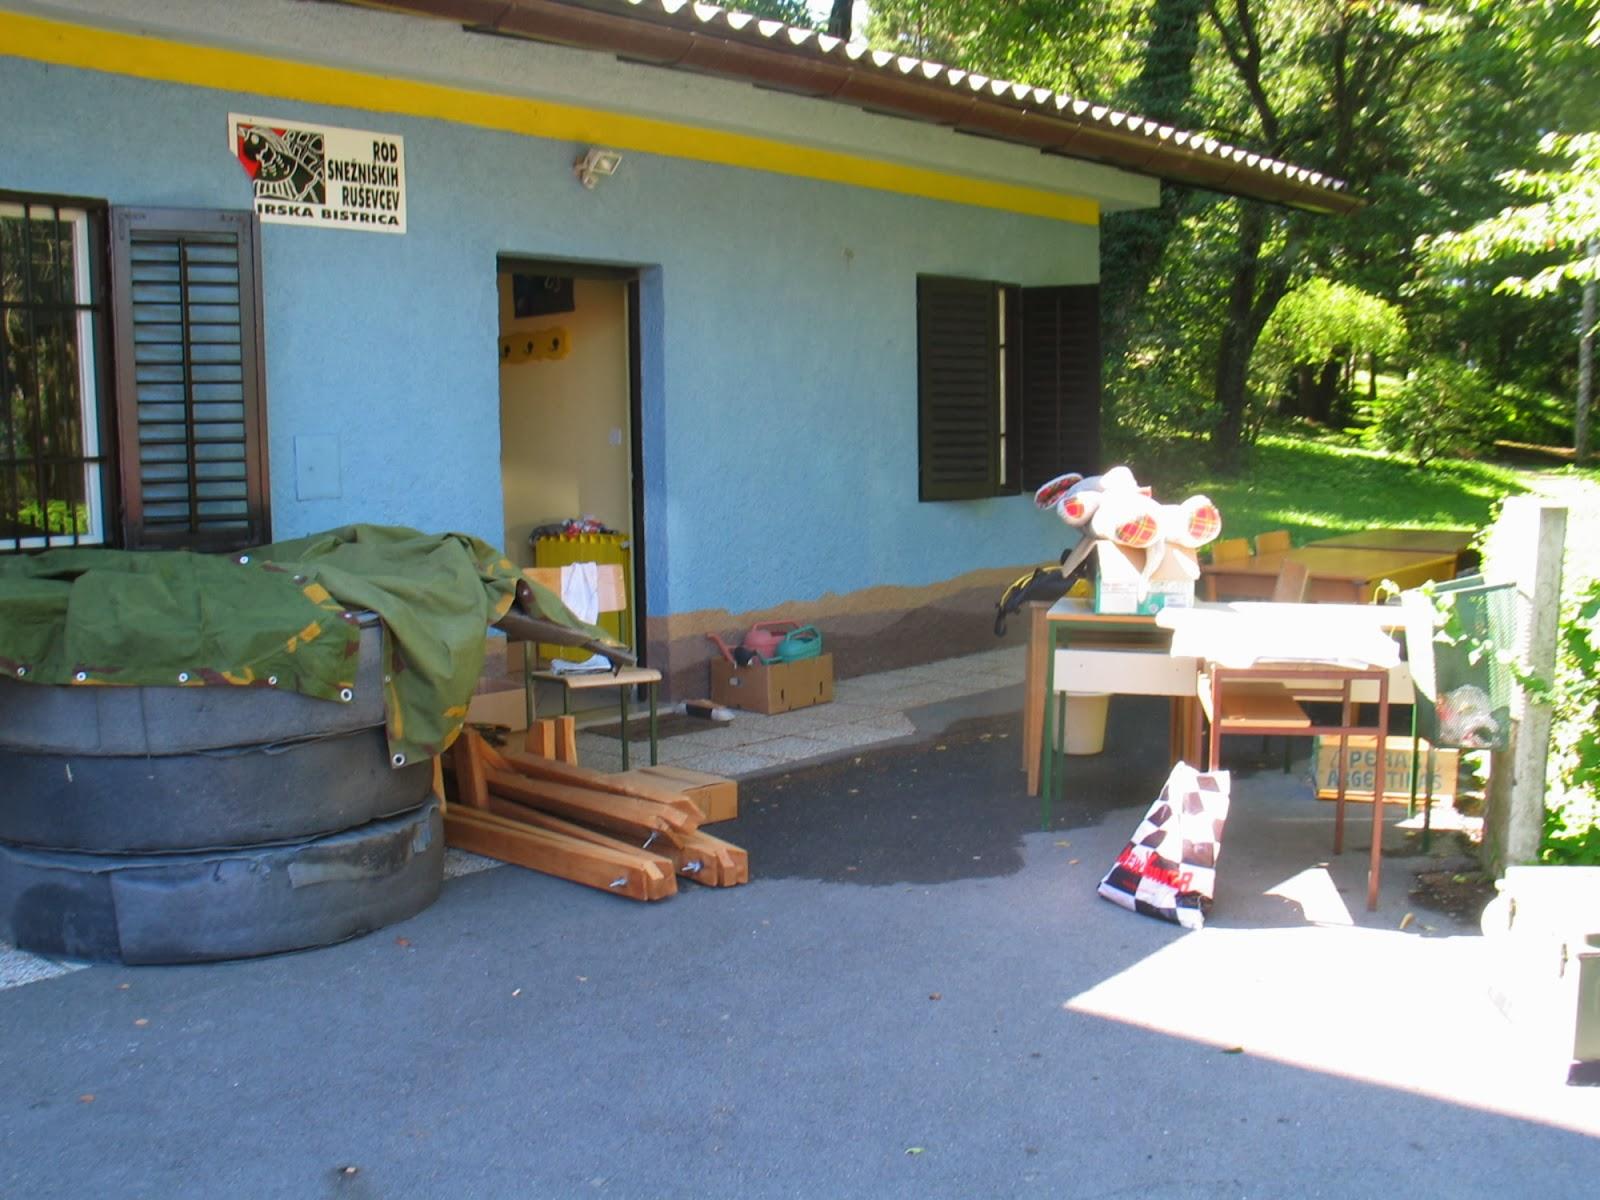 Pucanje taborniške, Ilirska Bistrica 2005 - pucanje%2Btaborni%25C5%25A1ke.jpg